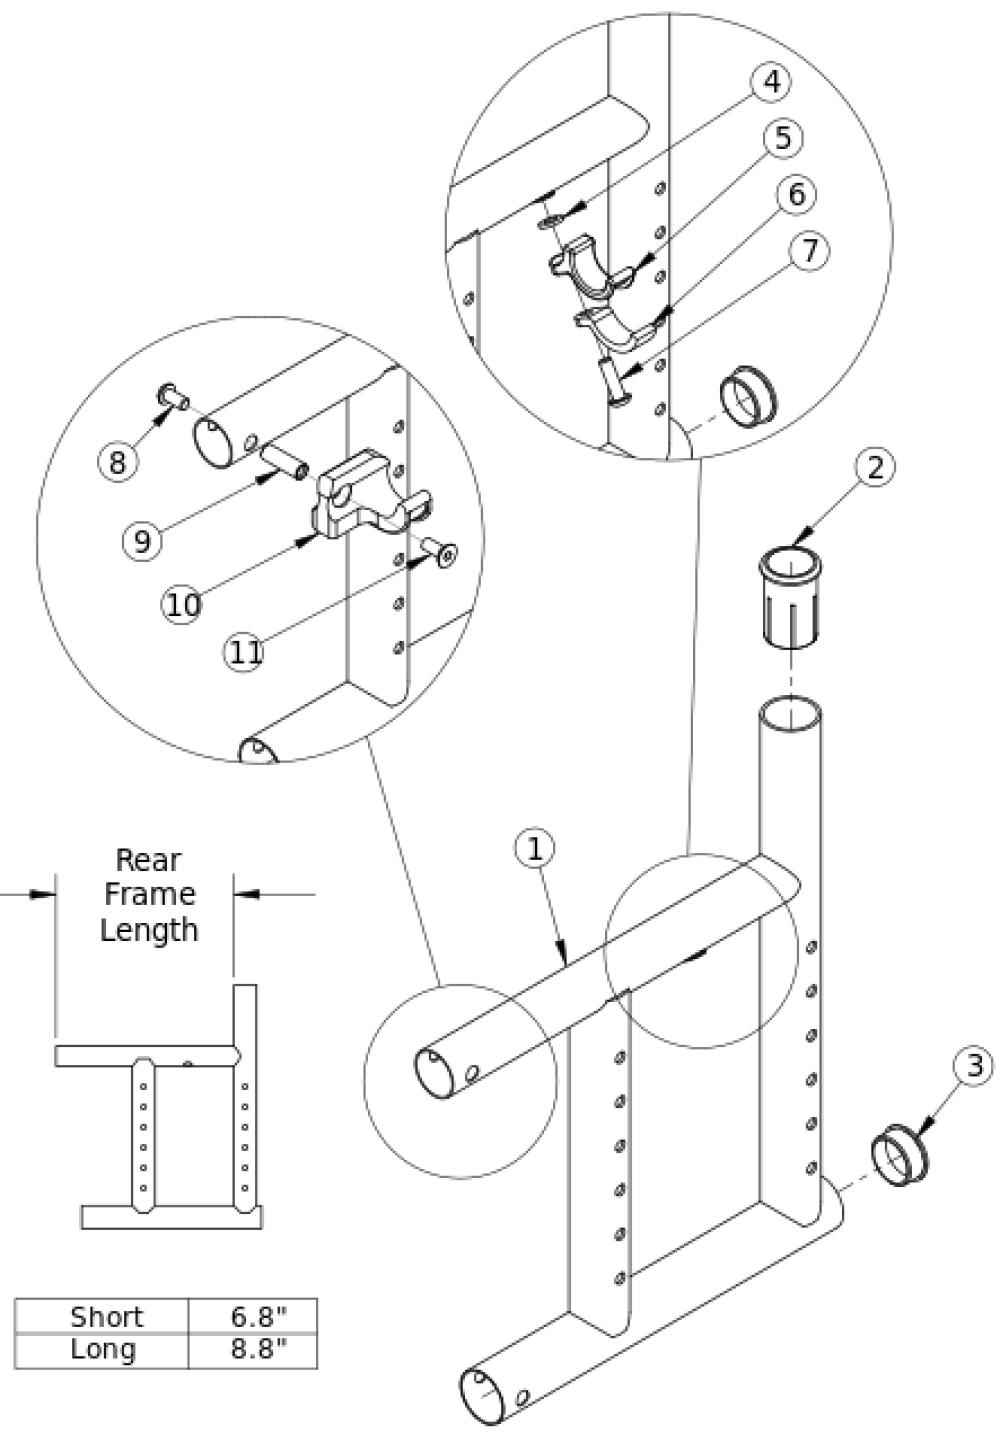 Catalyst 5ti Rear Frame parts diagram